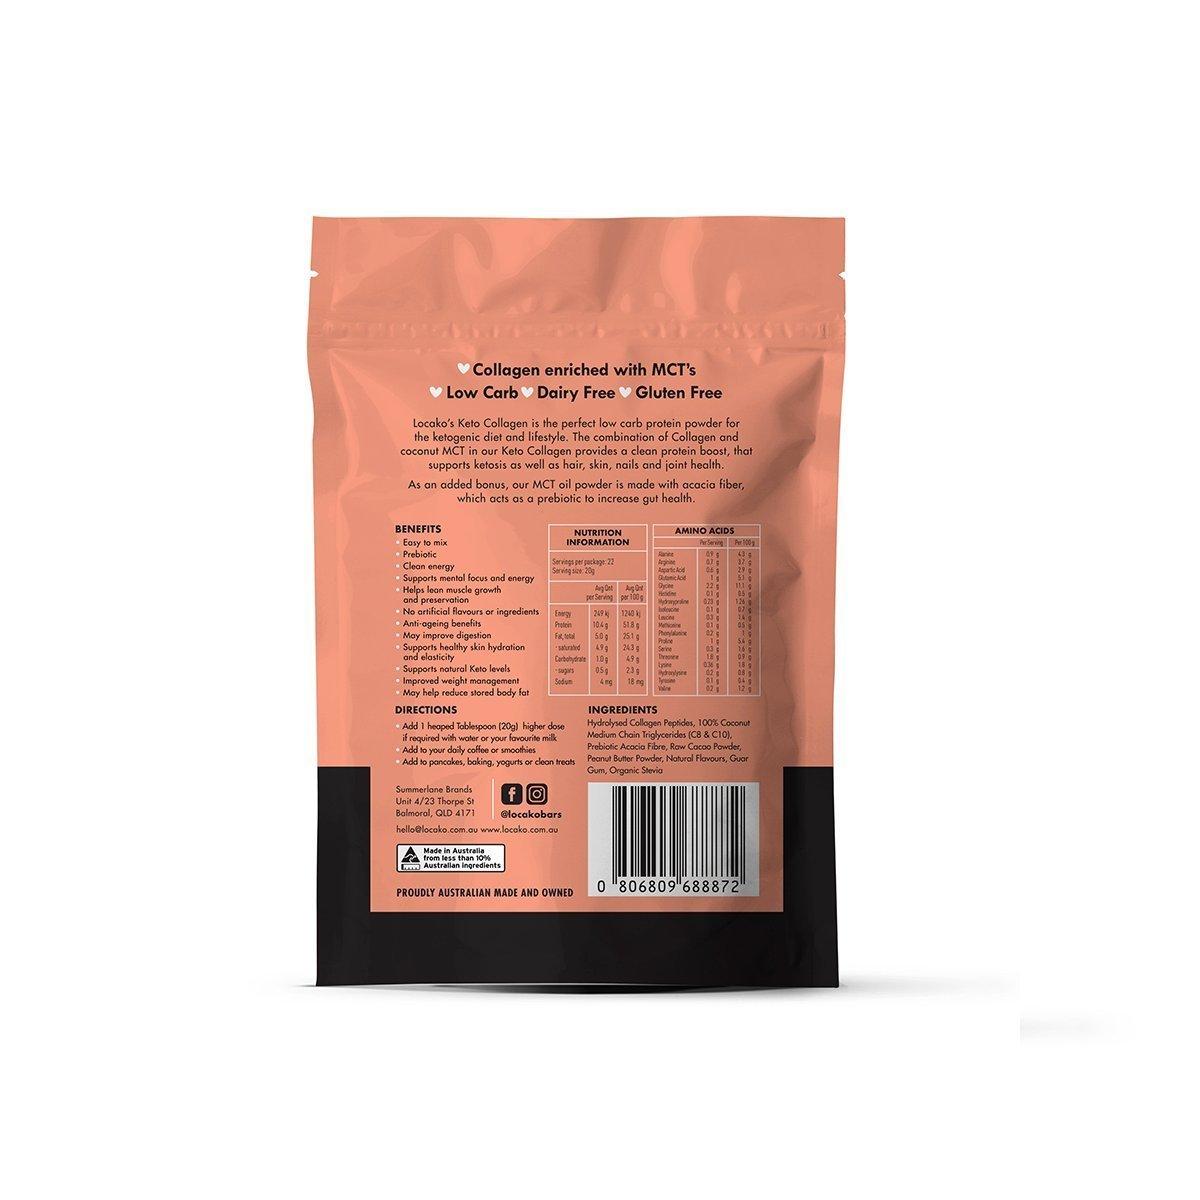 Locako Keto Collagen Chocolate Peanut Butter 440g_media-02